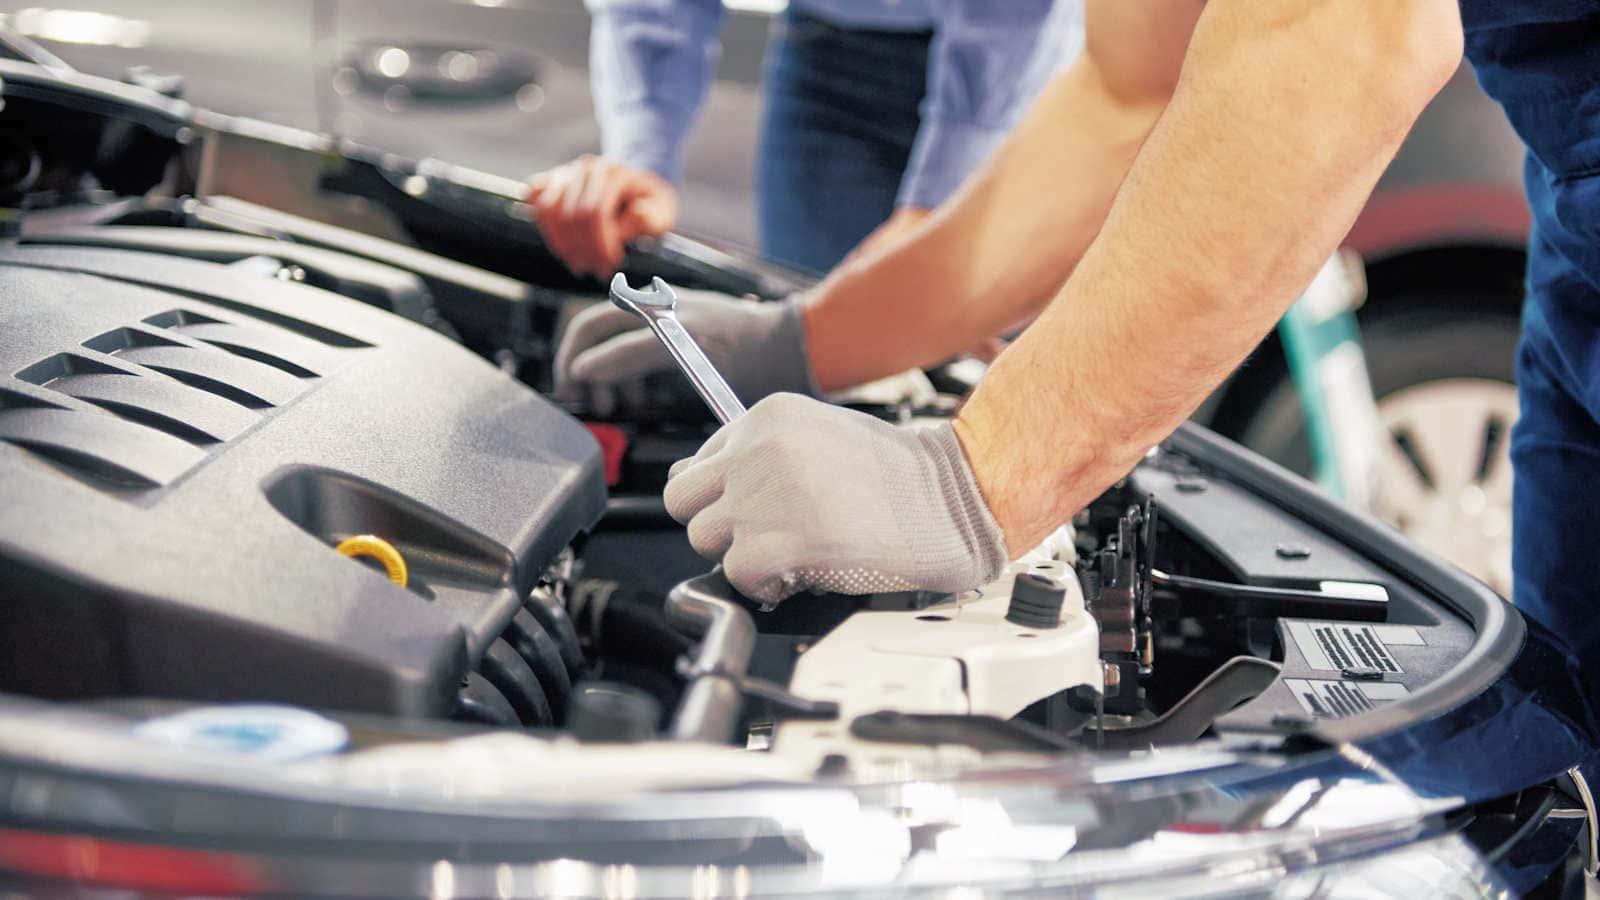 R & M Auto Repair Xperts of Las Vegas